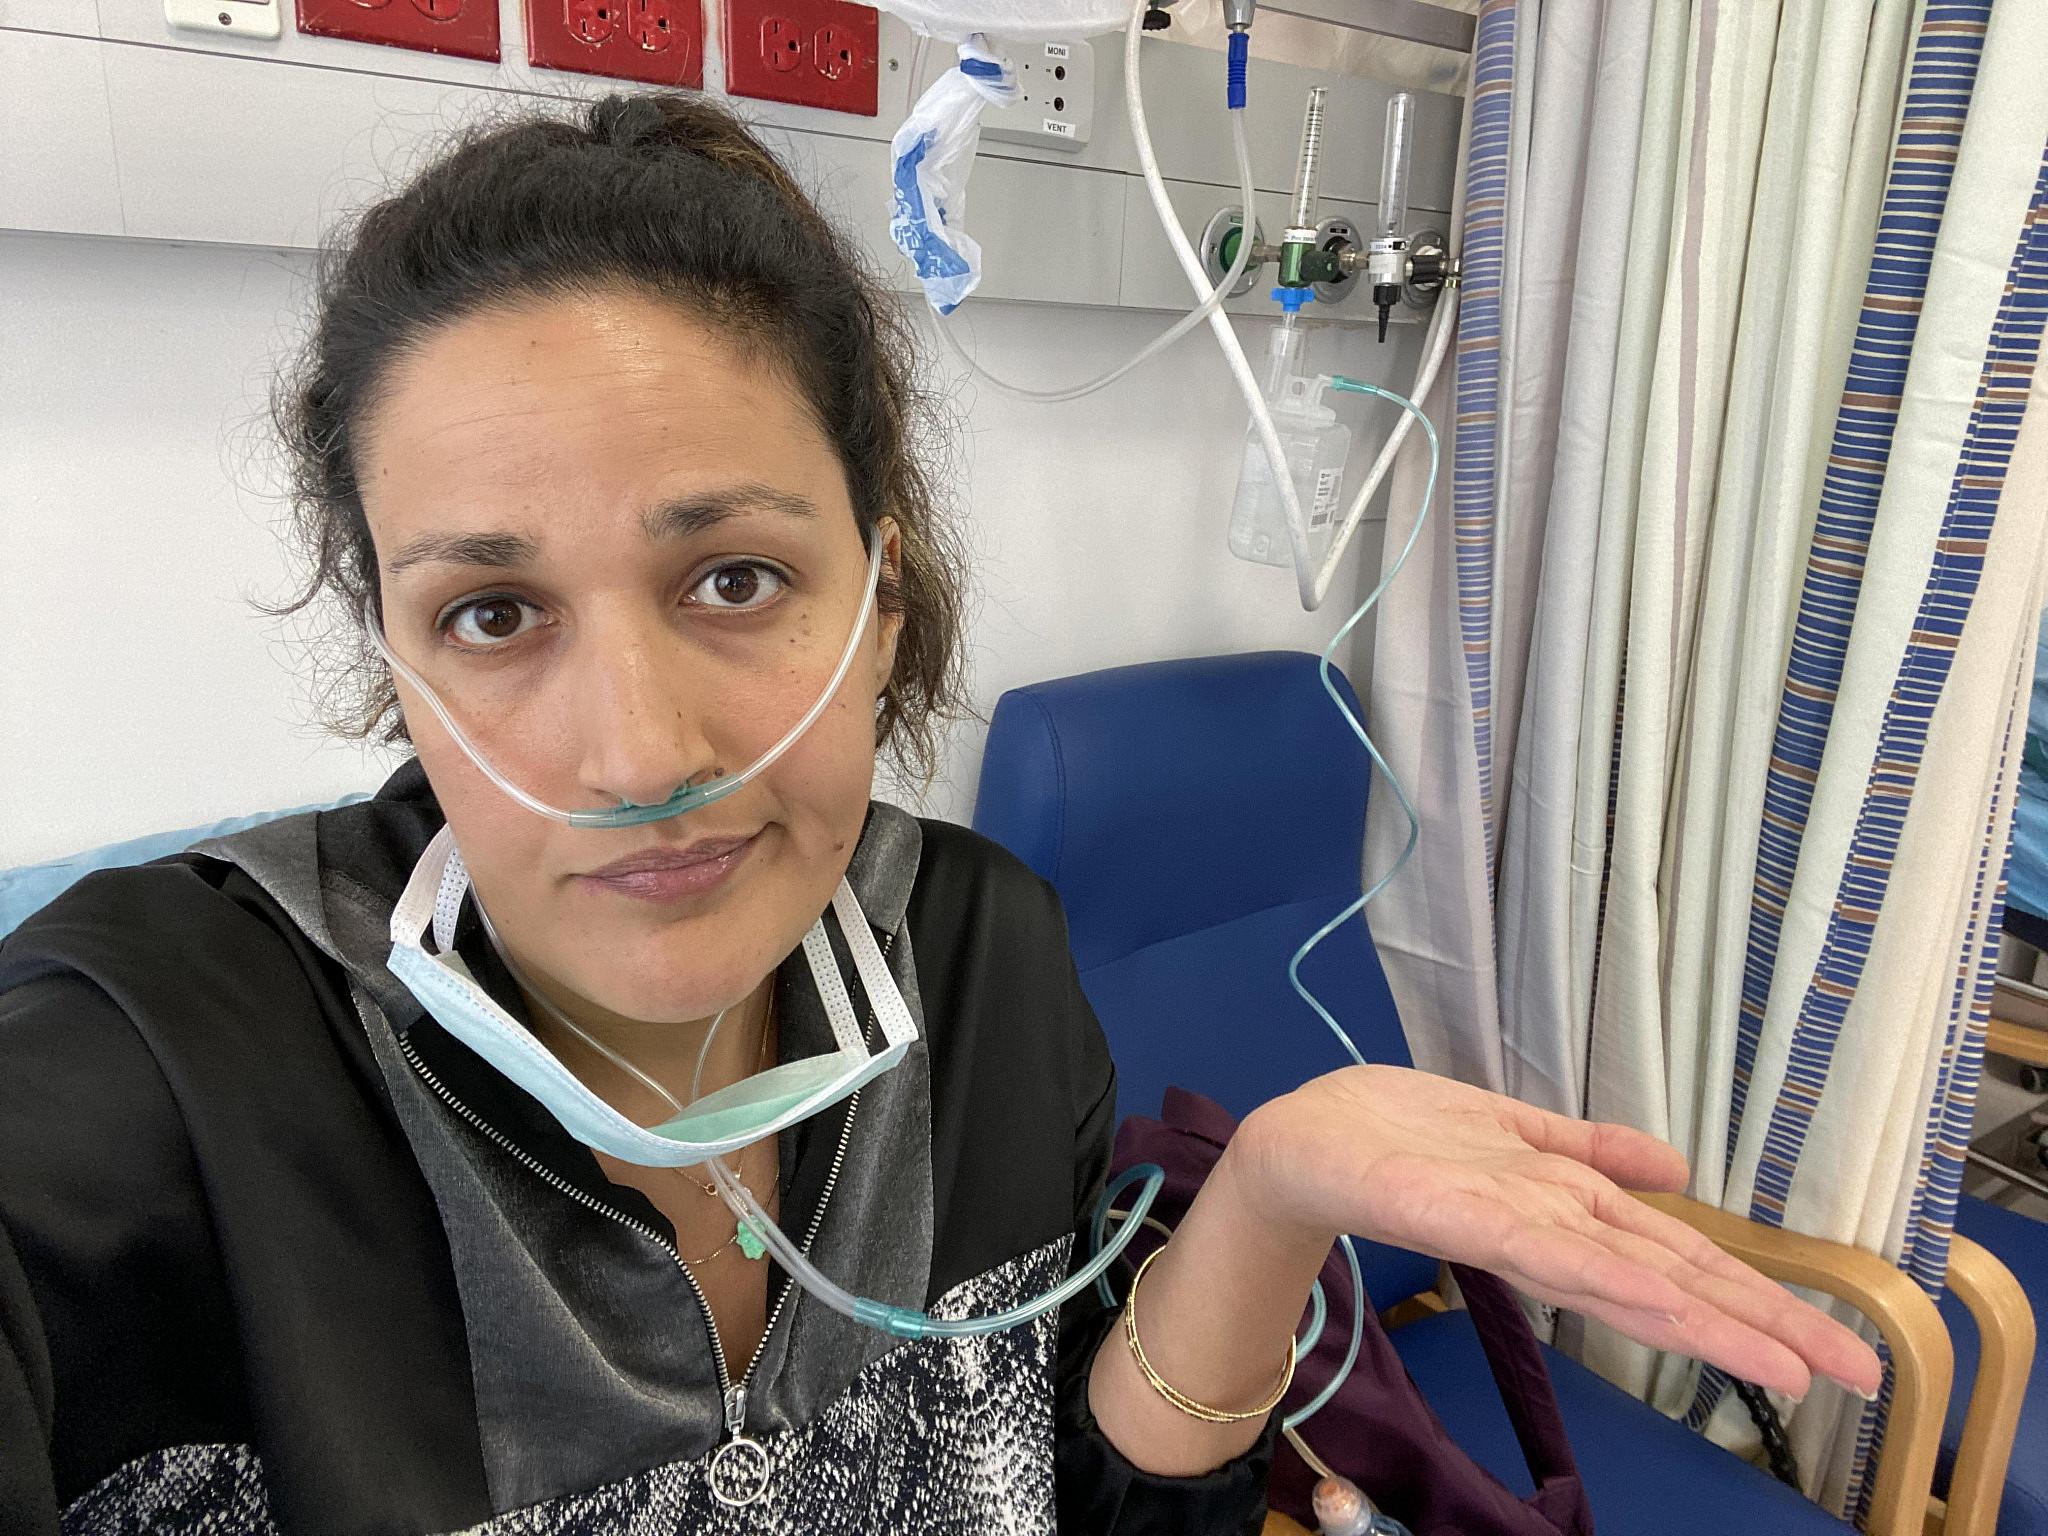 Noam Shuster at Hadassah Hospital in Jerusalem, April 11, 2020. (Courtesy of Noam Shuster)